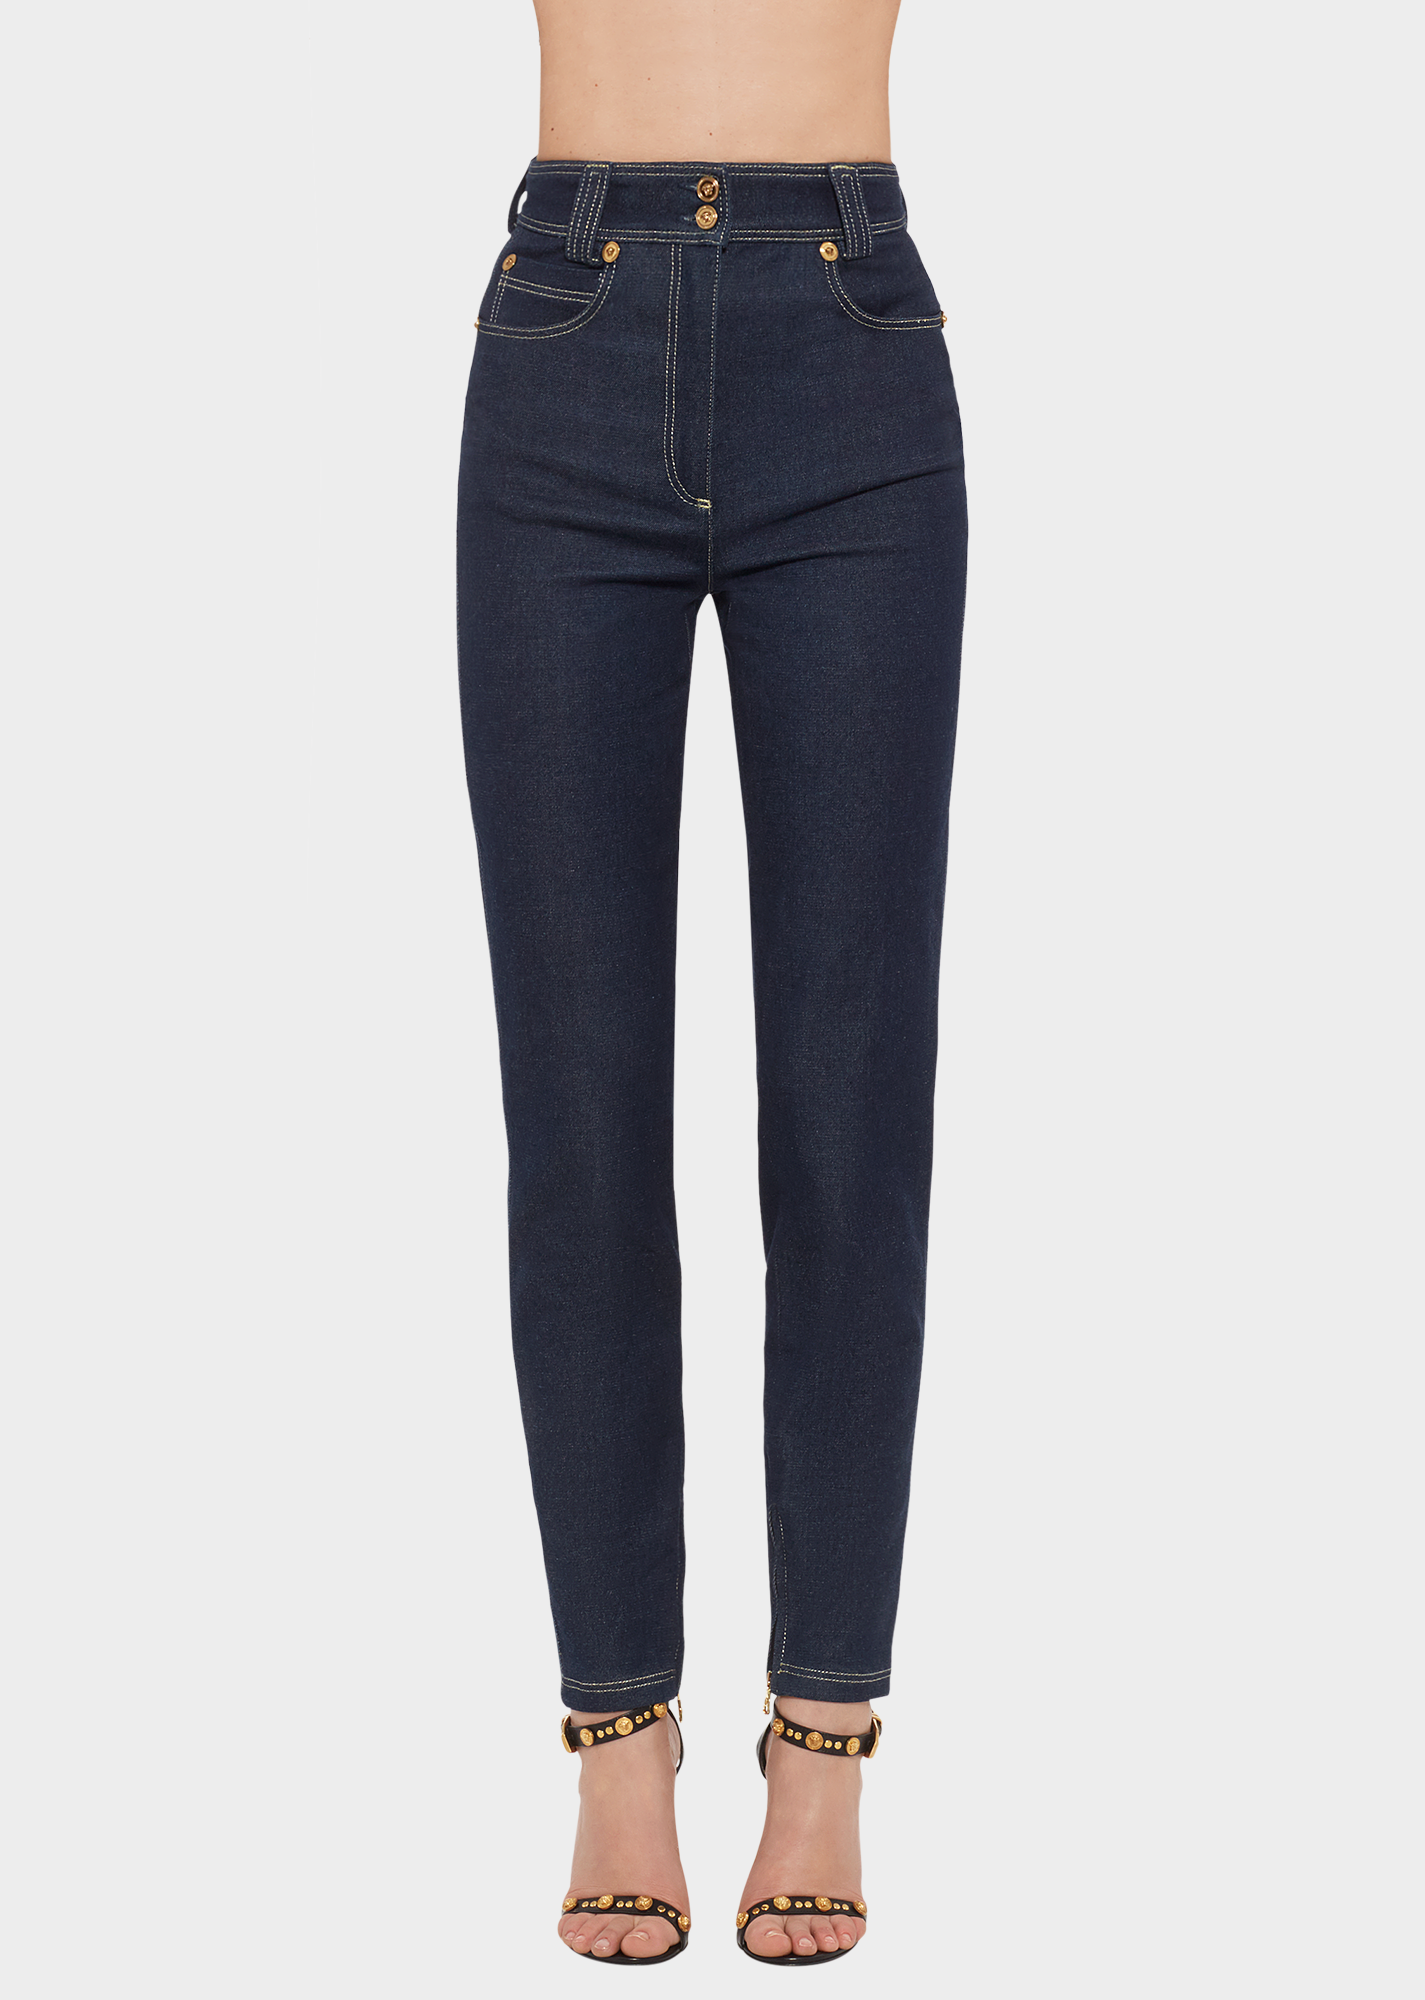 58b9ba71ff Skinny Tribute Jeans - Blue Pants & Jeans   Jeans